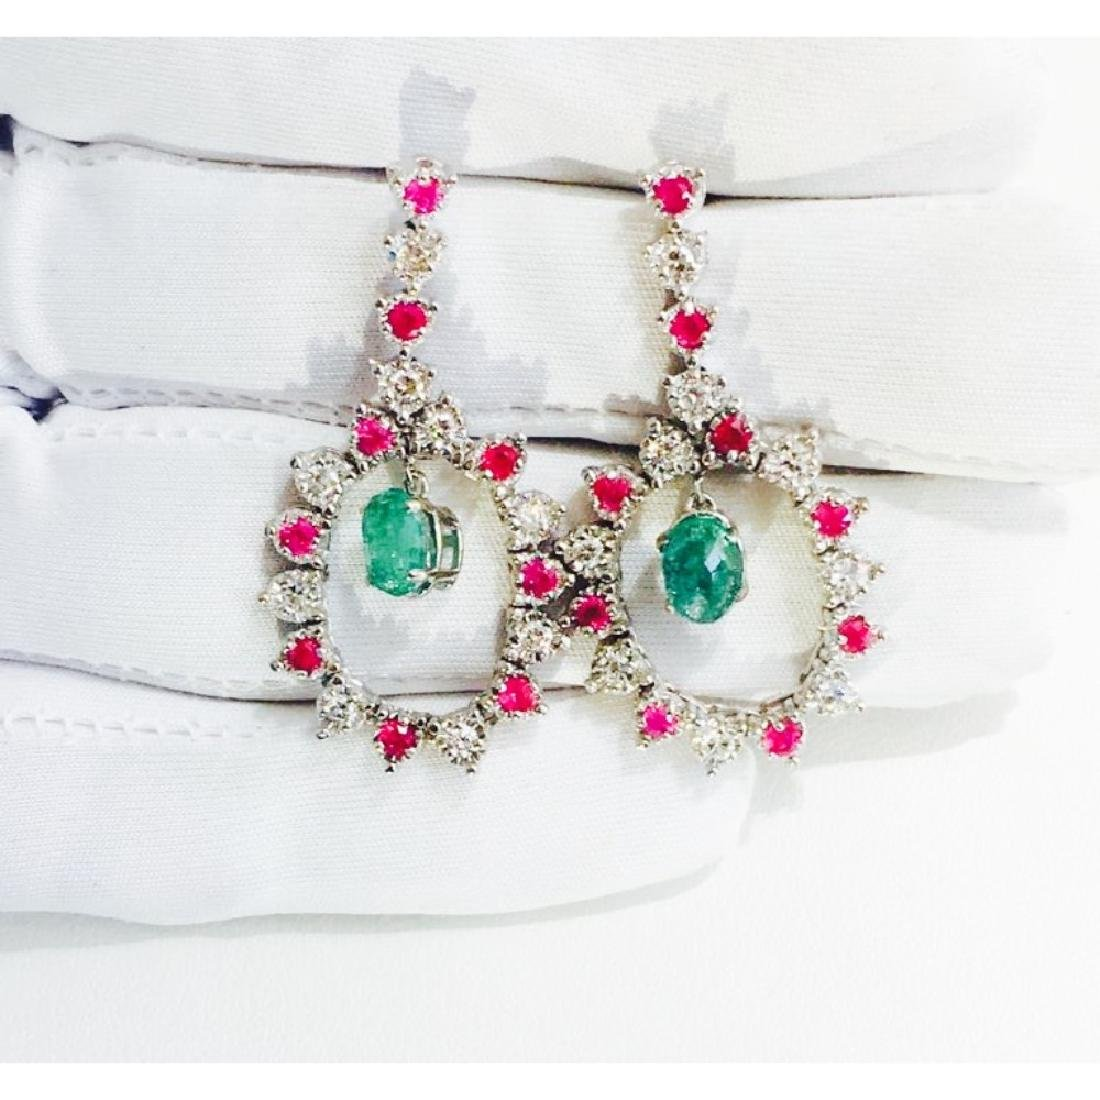 14K; Super Burma Ruby, Emerald & VS-F Diamond earrings